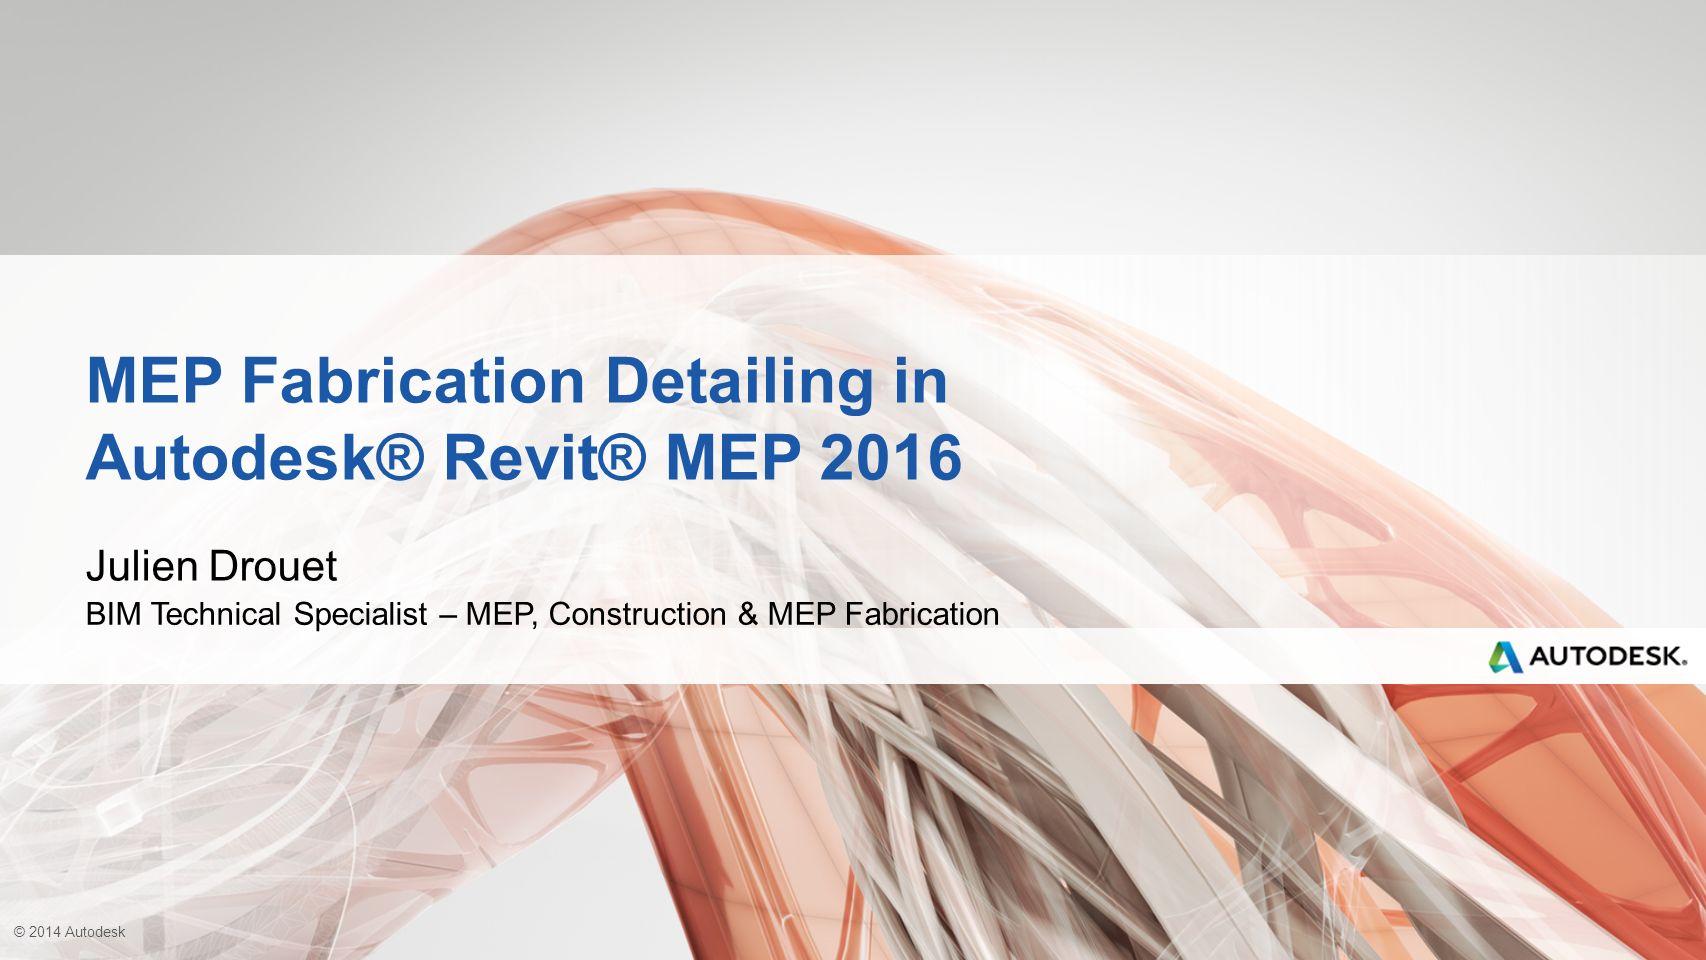 MEP Fabrication Detailing in Autodesk® Revit® MEP 2016